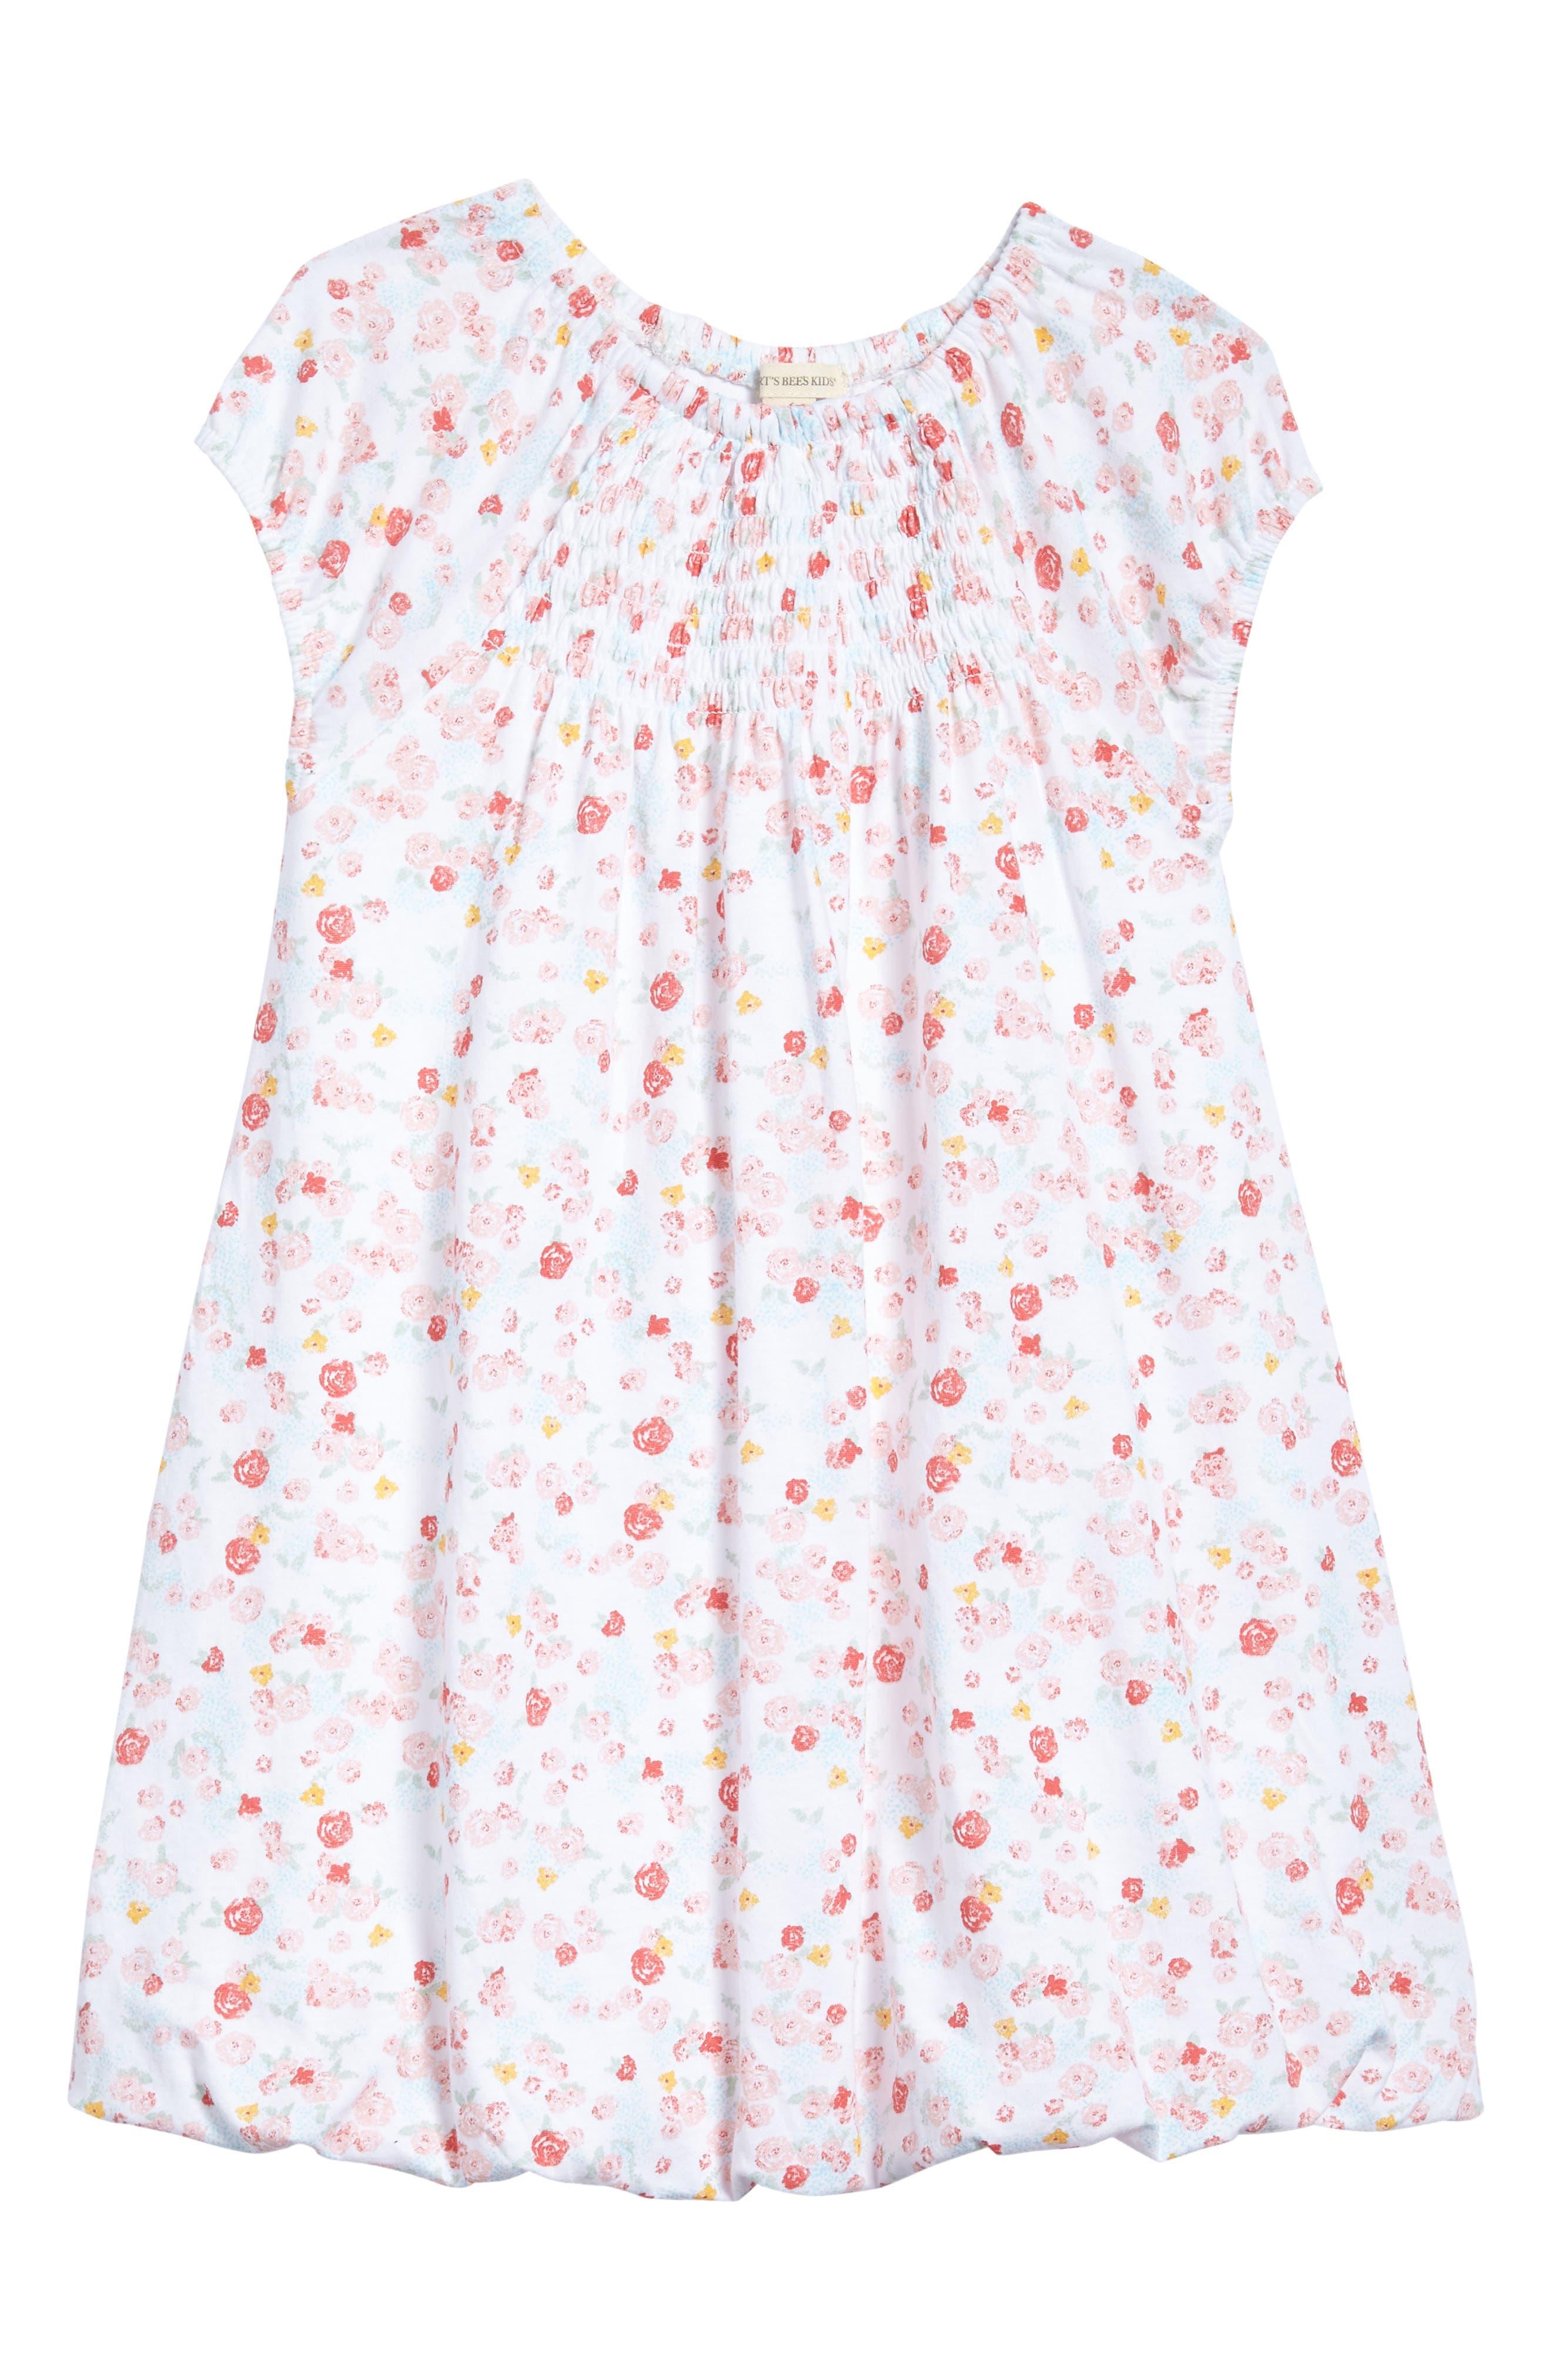 Ditsy Floral Print Bubble Dress,                             Main thumbnail 1, color,